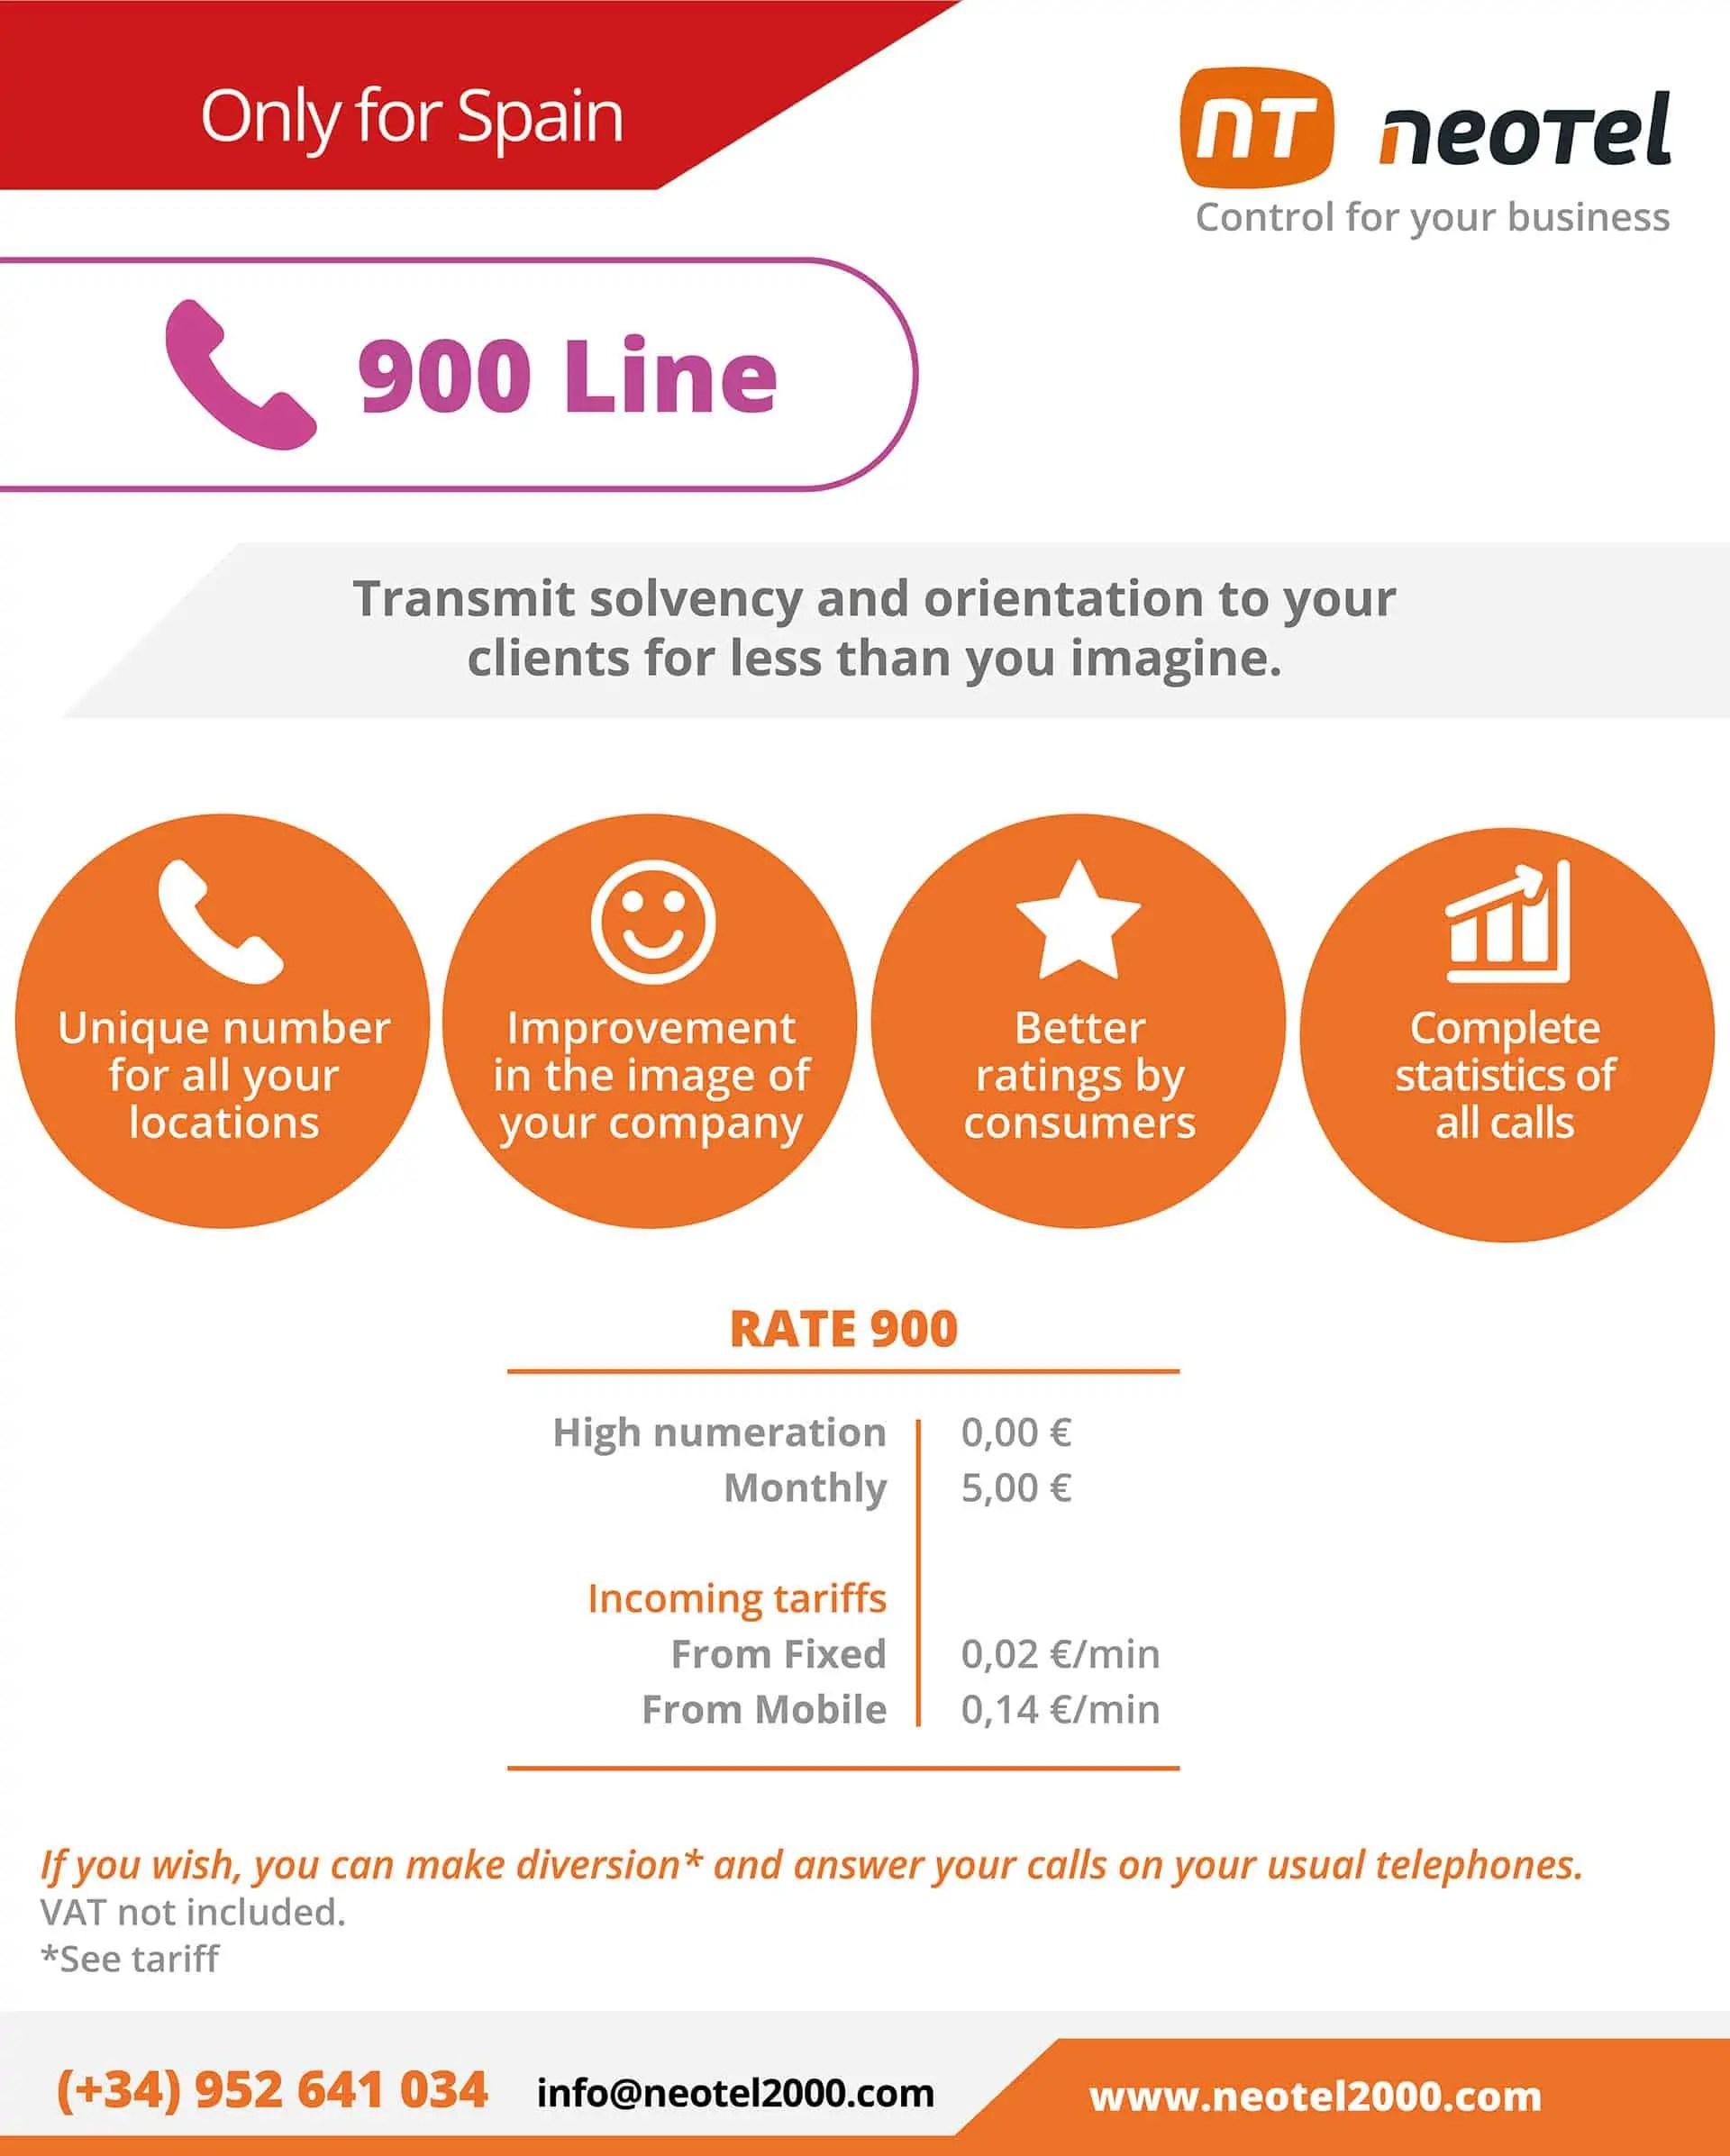 hire line 900